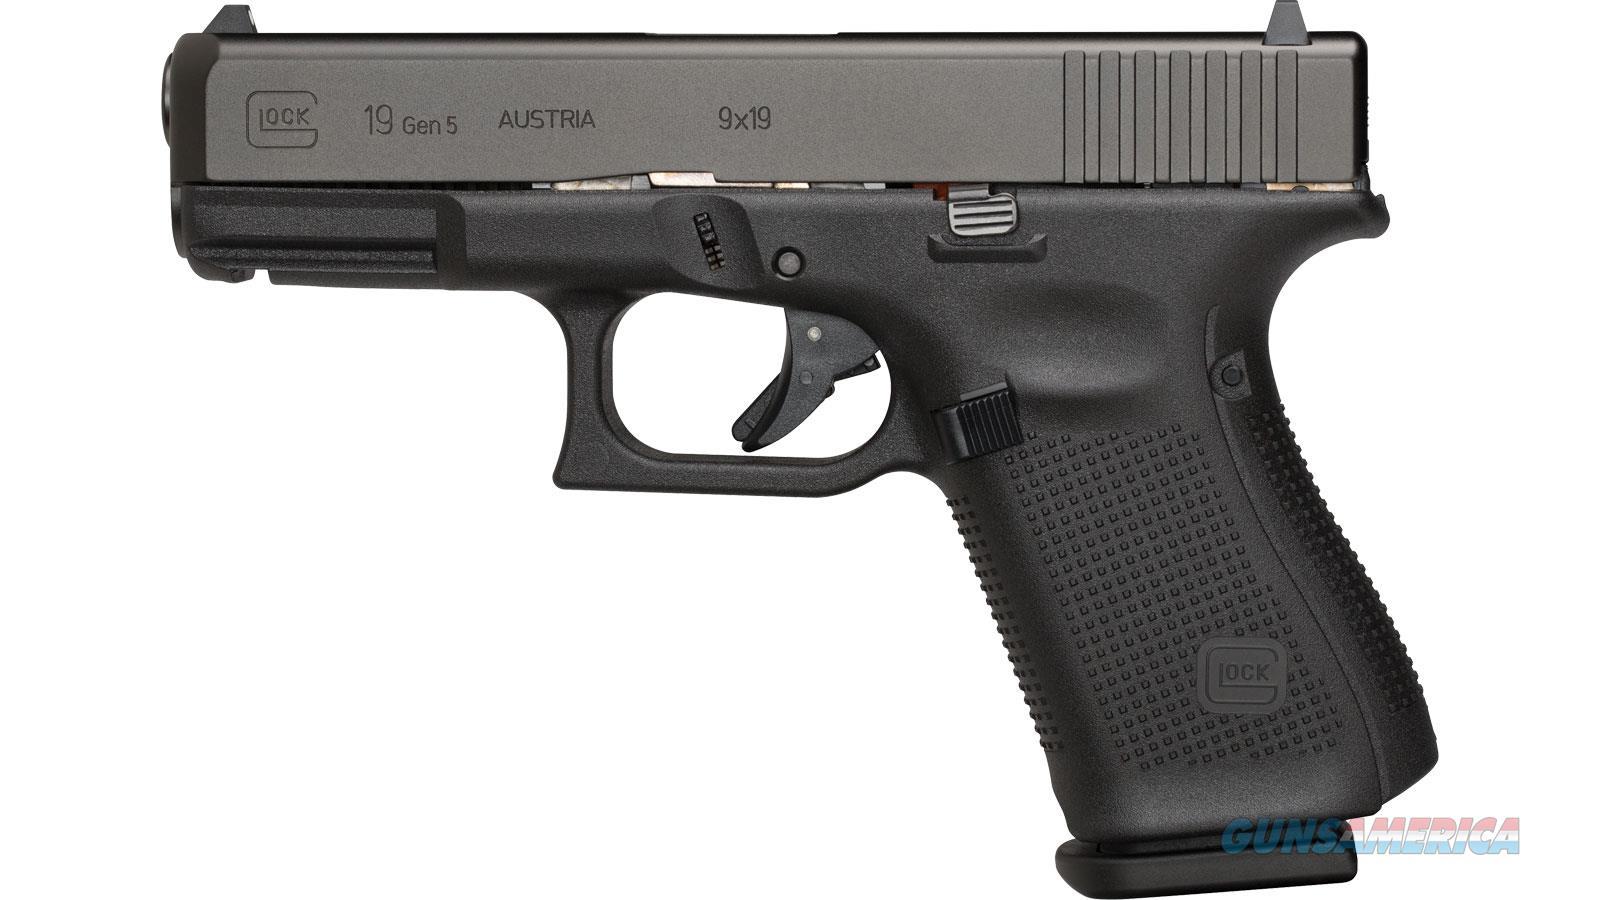 "Glock G19 Gen5 Semi-Auto Pistol, 9Mm, 4.02"" Bbl, Poly Grip, 10+1 Rnd Fixed Sights PA1950201  Guns > Pistols > G Misc Pistols"